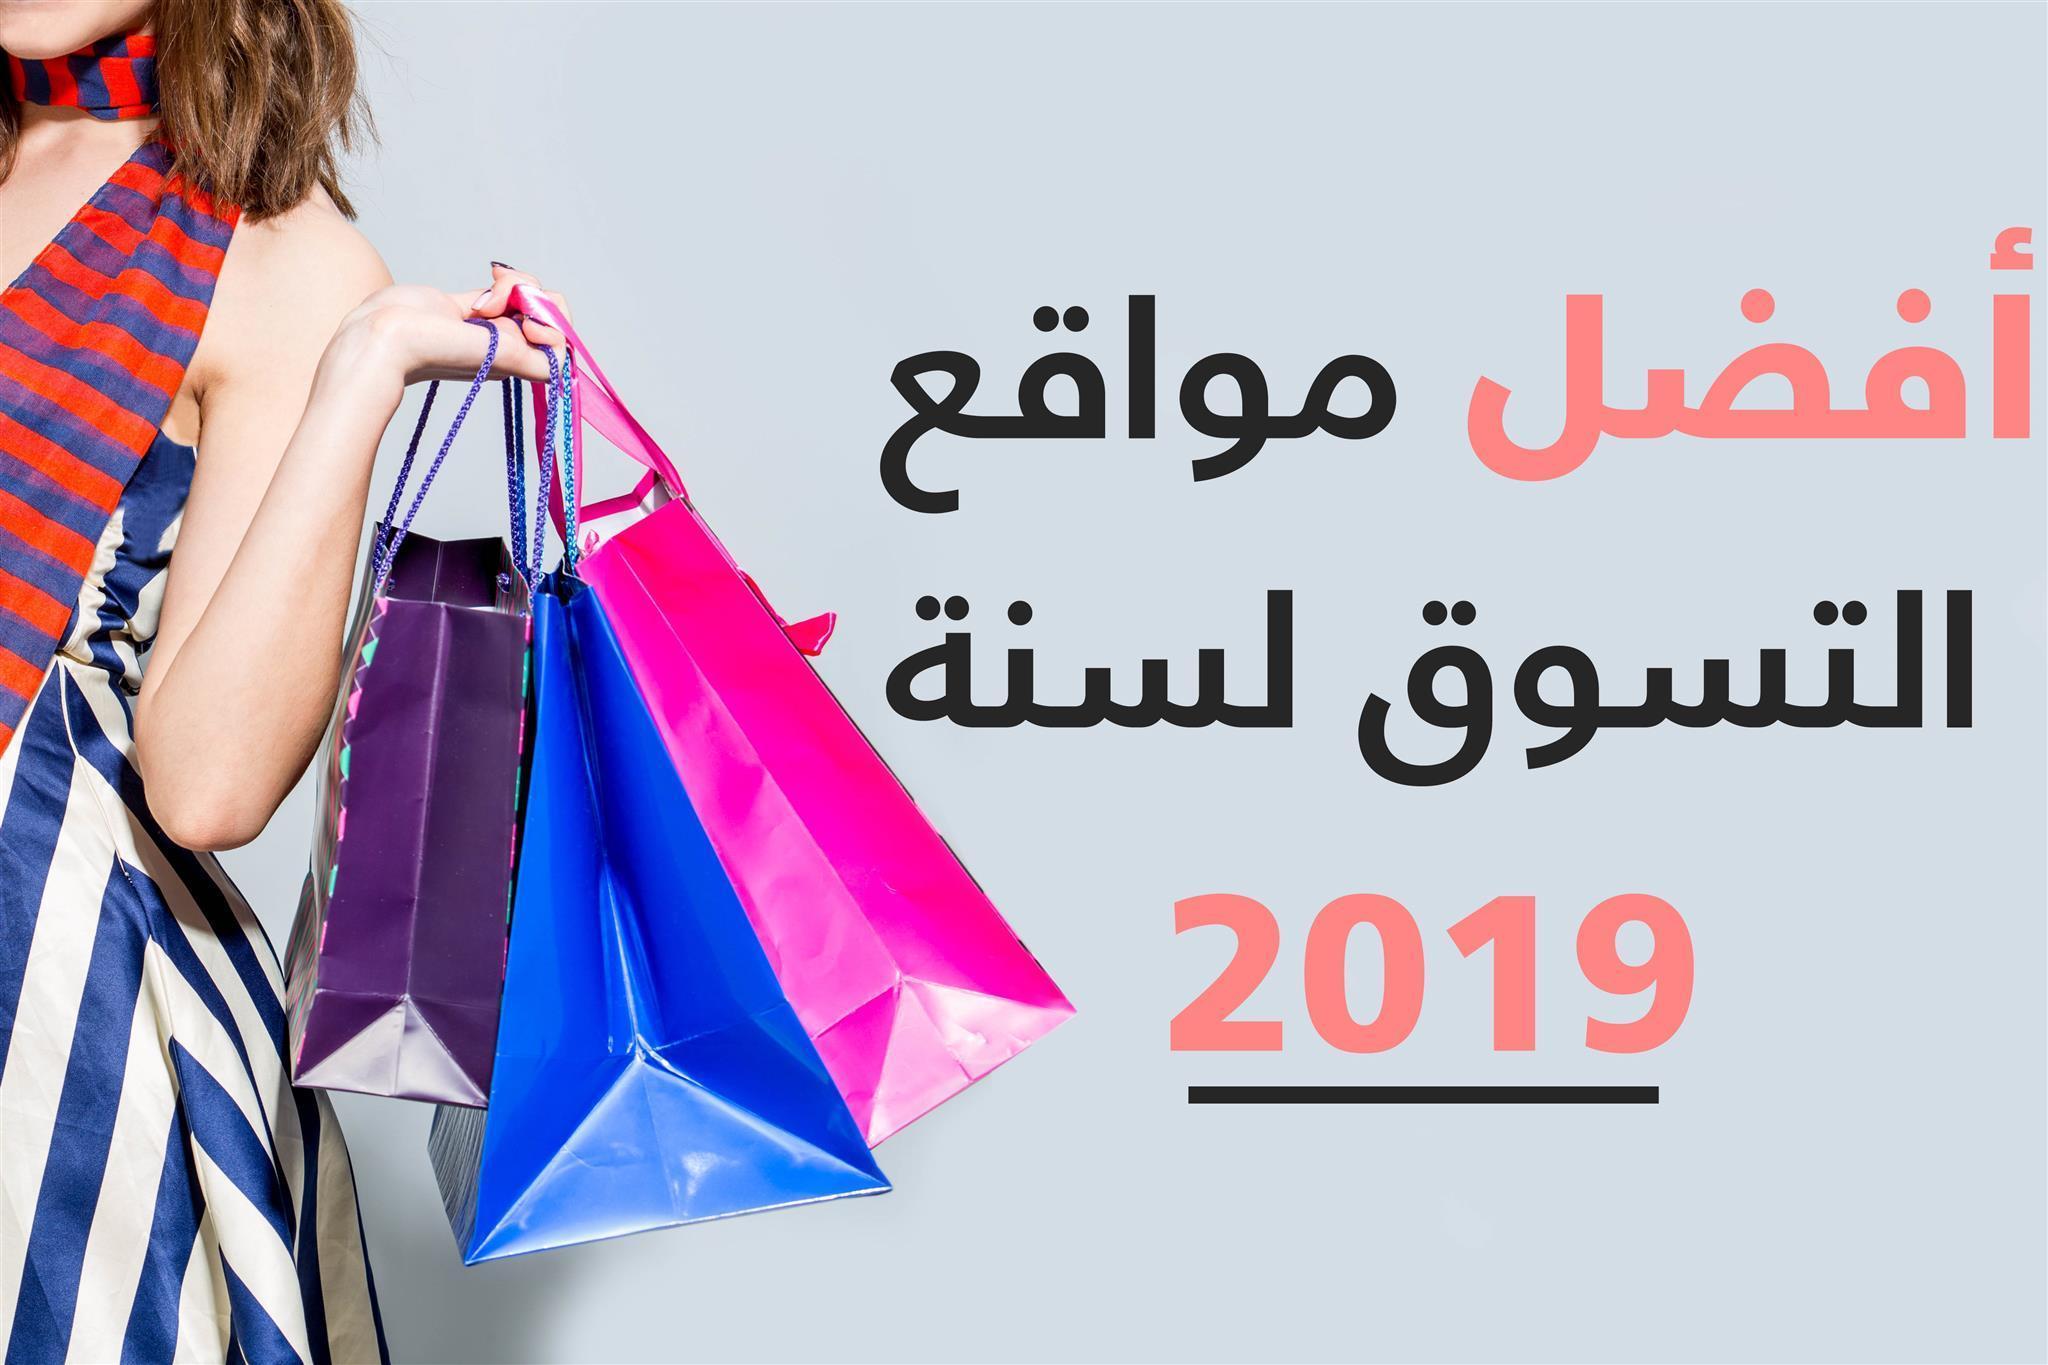 4c5f58b61 أشهر 10 مواقع تسوق رخيصة فى السعودية بتخفيضات مميزة حتي 75% الأن